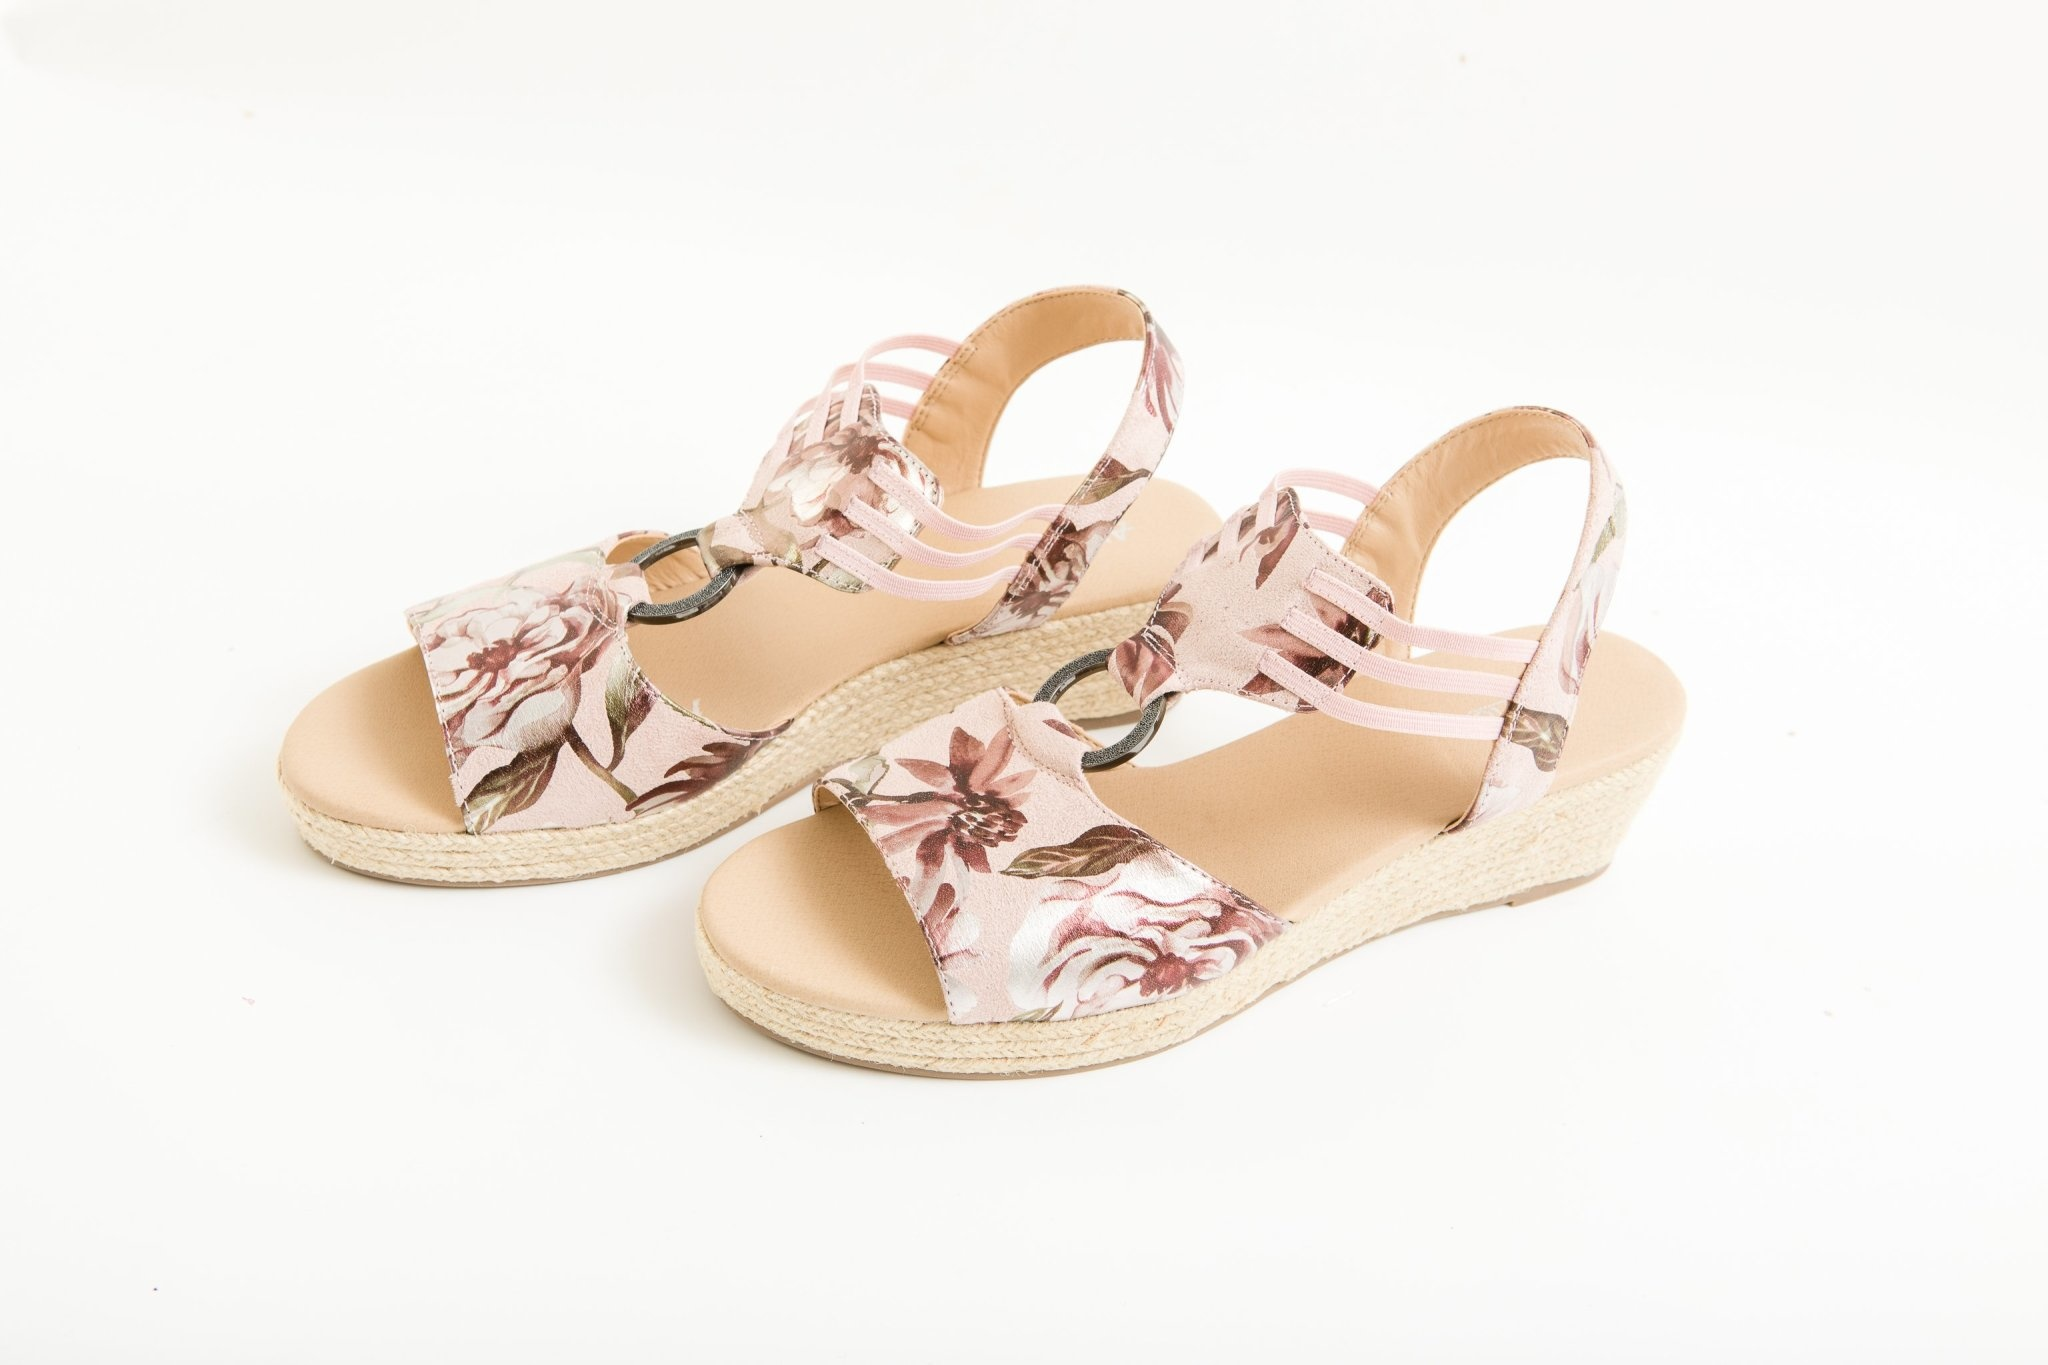 Floral Wedge Sandal